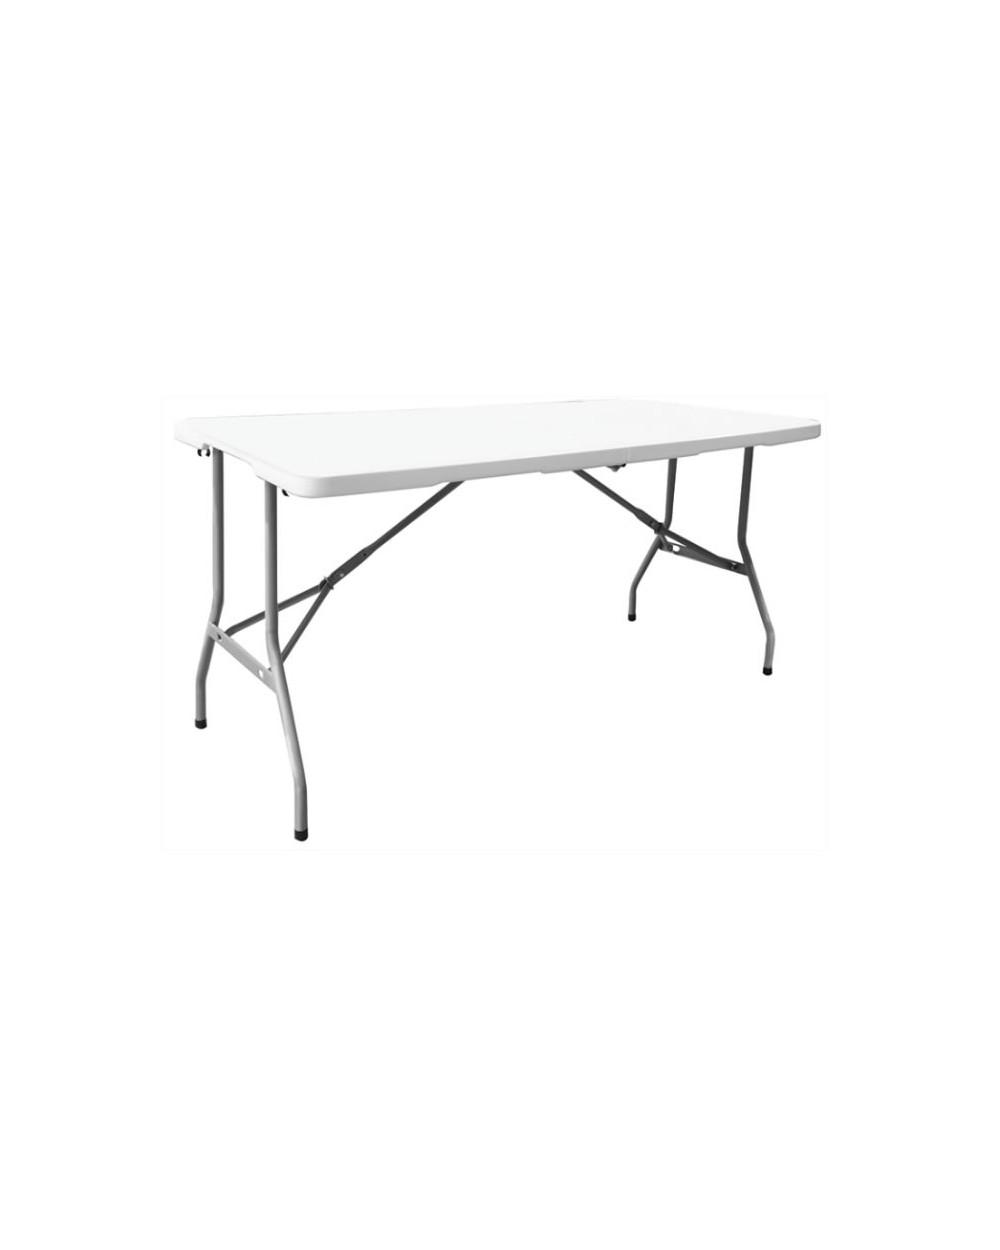 Northwest Mesa Rectangular Plegable Table 180